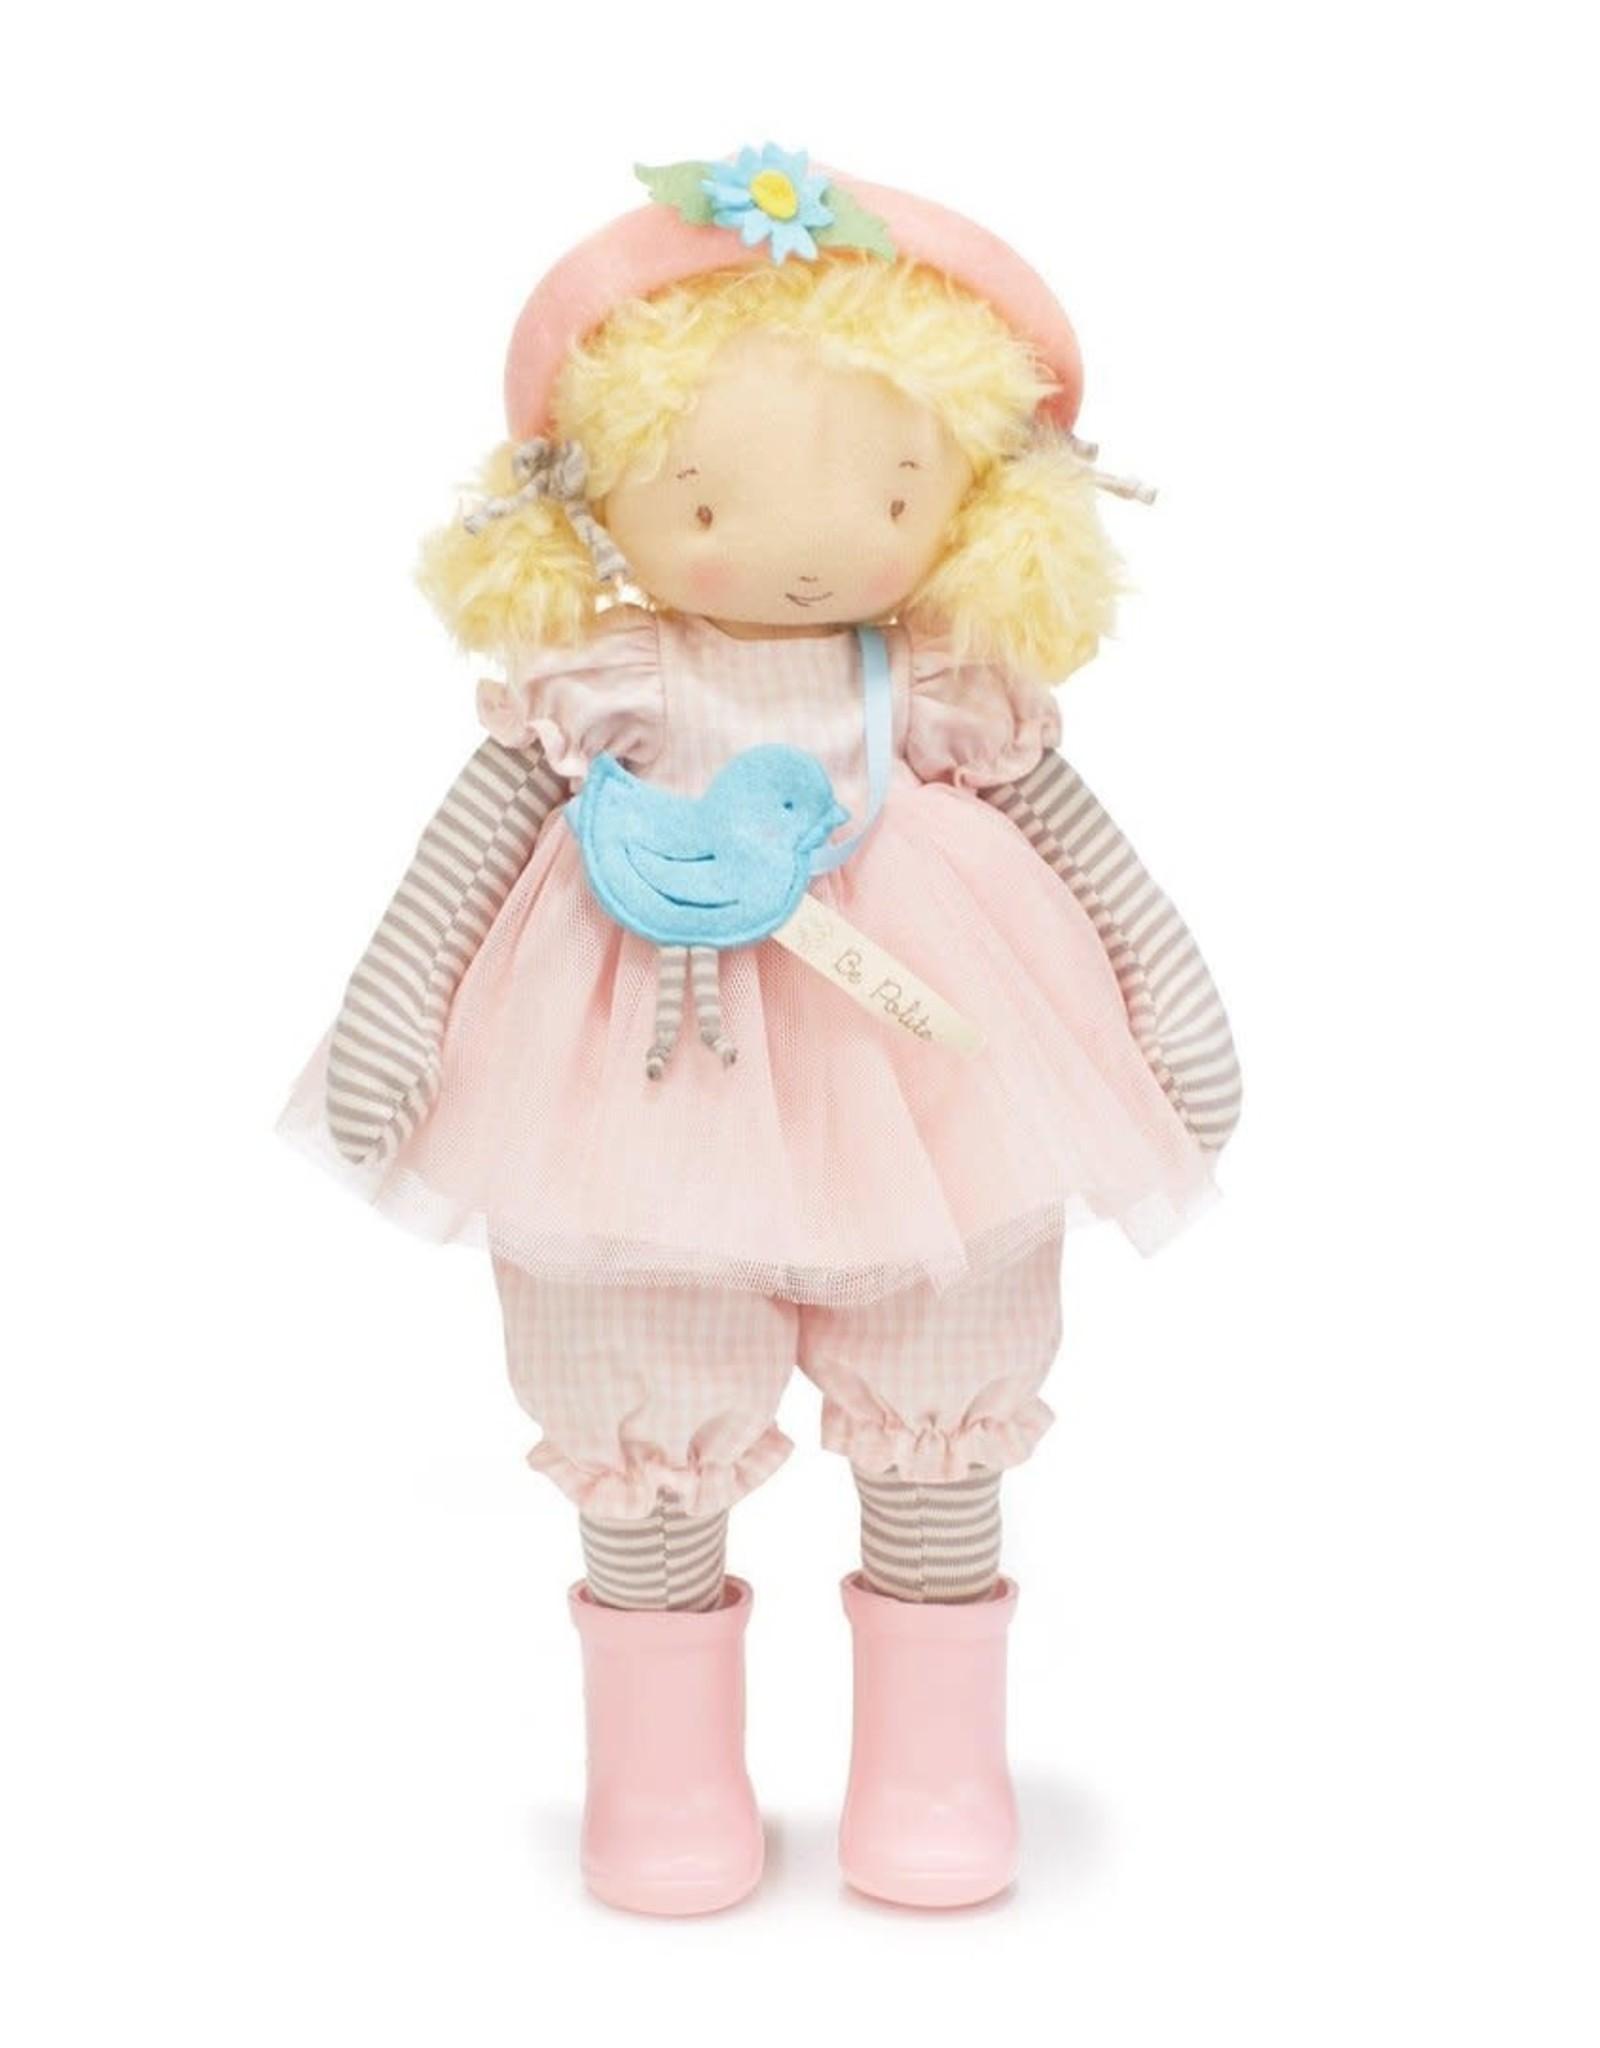 Bunnies by the Bay Elsie Girl Doll